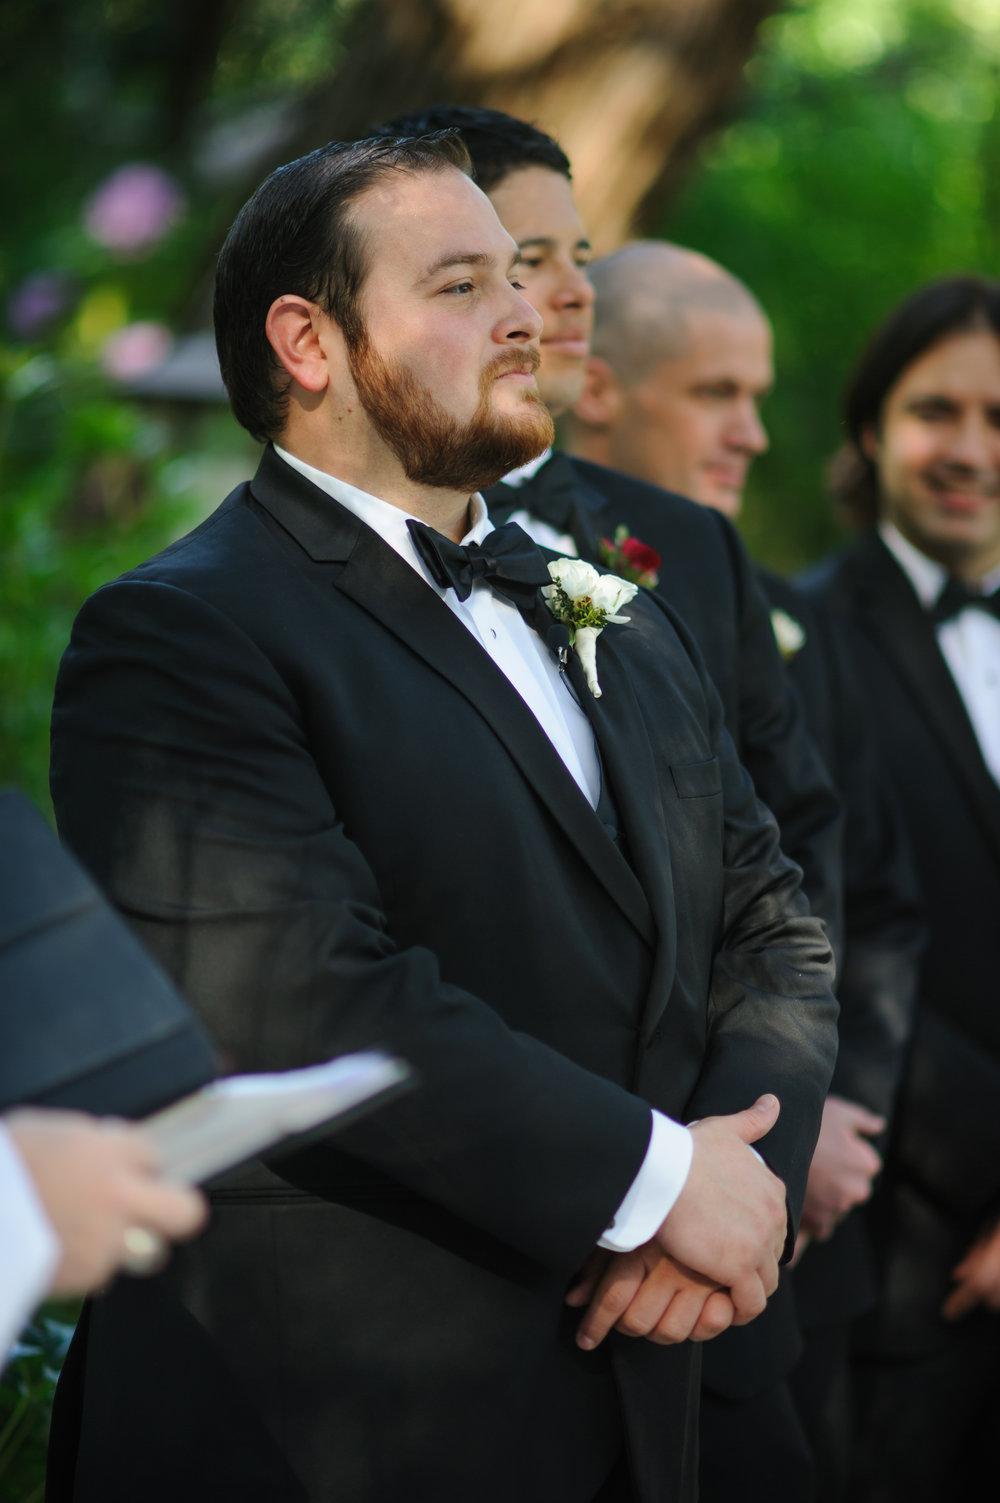 lindsey-charlie-060-monte-verde-inn-foresthill-wedding-photographer-katherine-nicole-photography.JPG